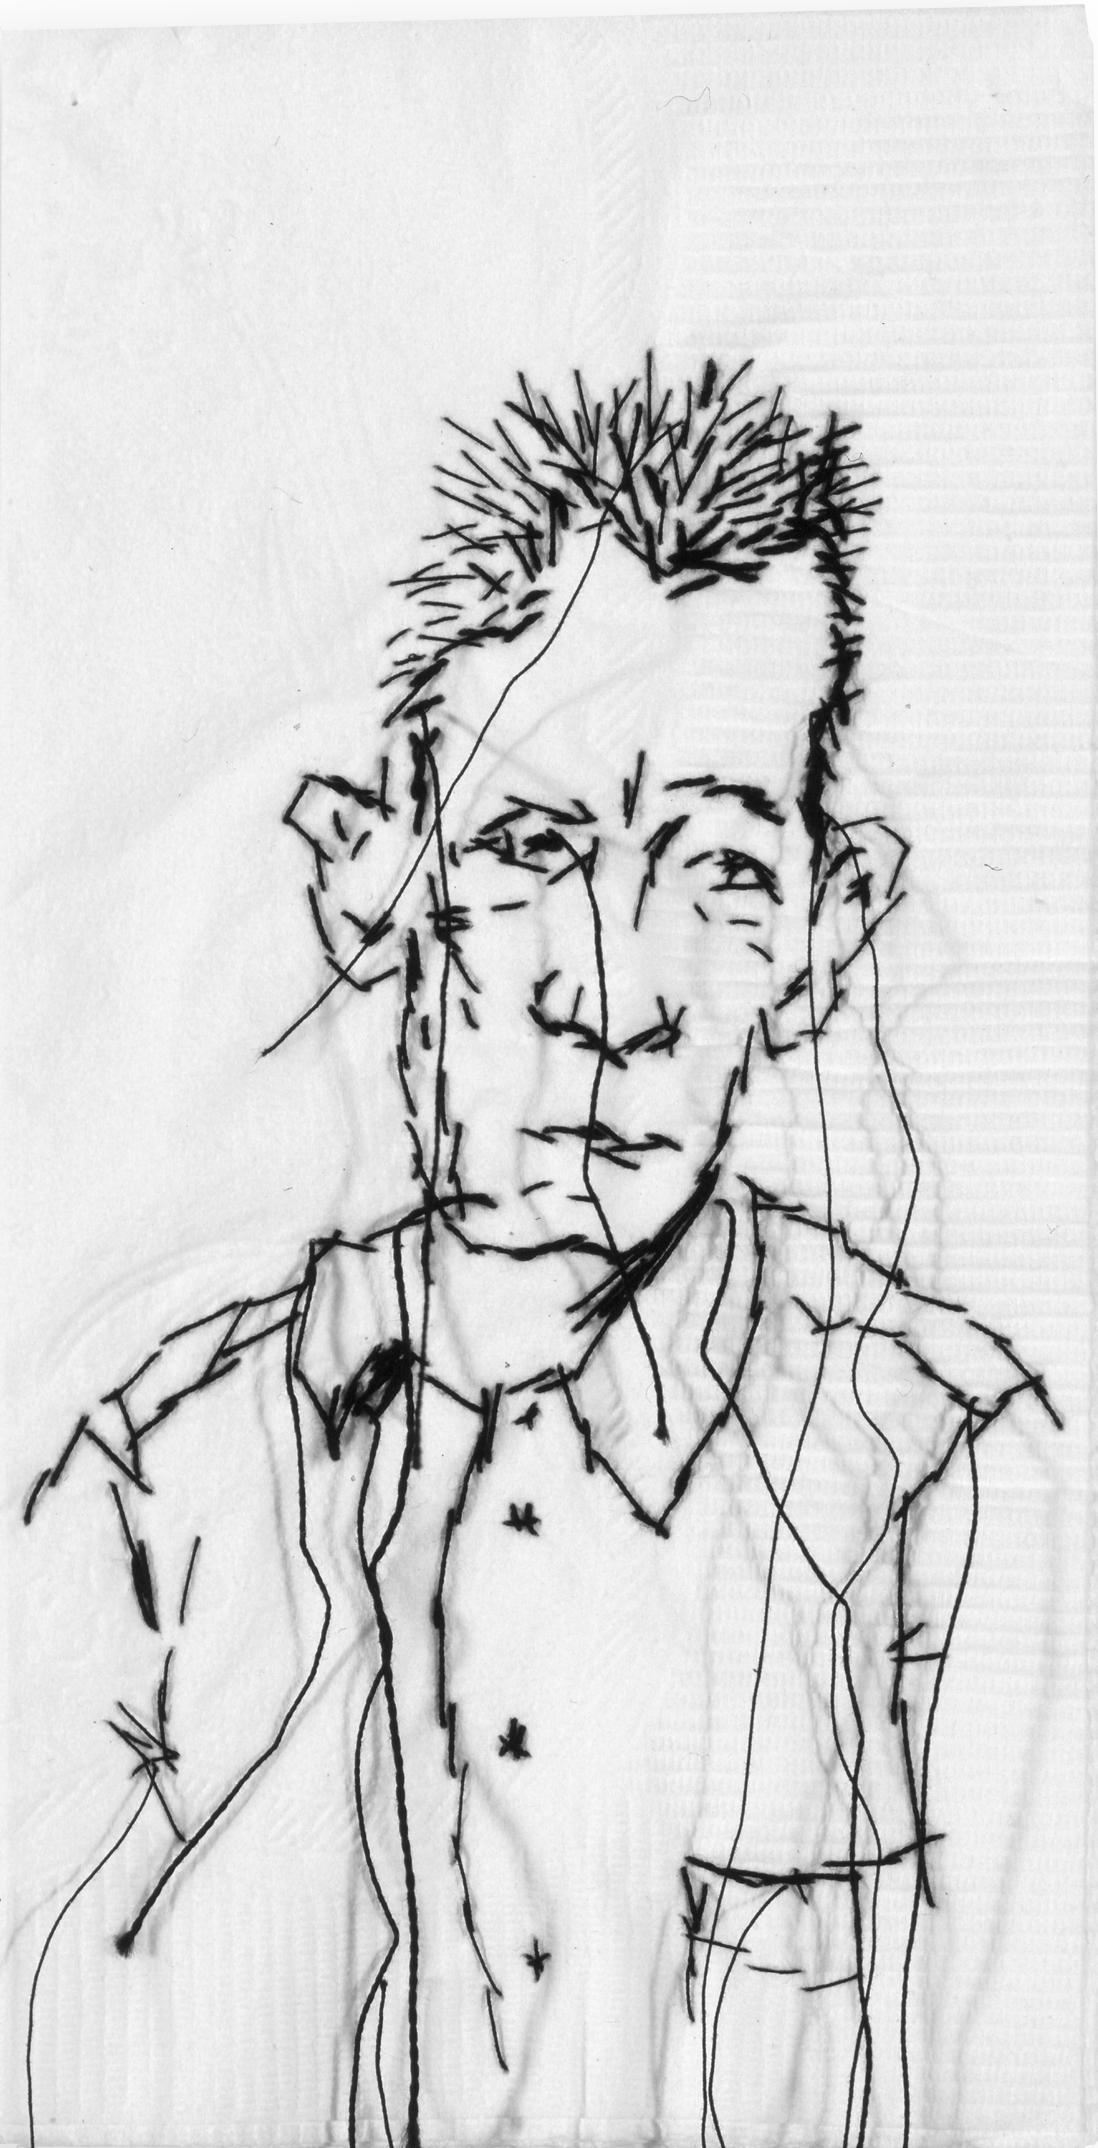 "Kyle  Black thread on paper napkin, 7"" x 4"", 2005"